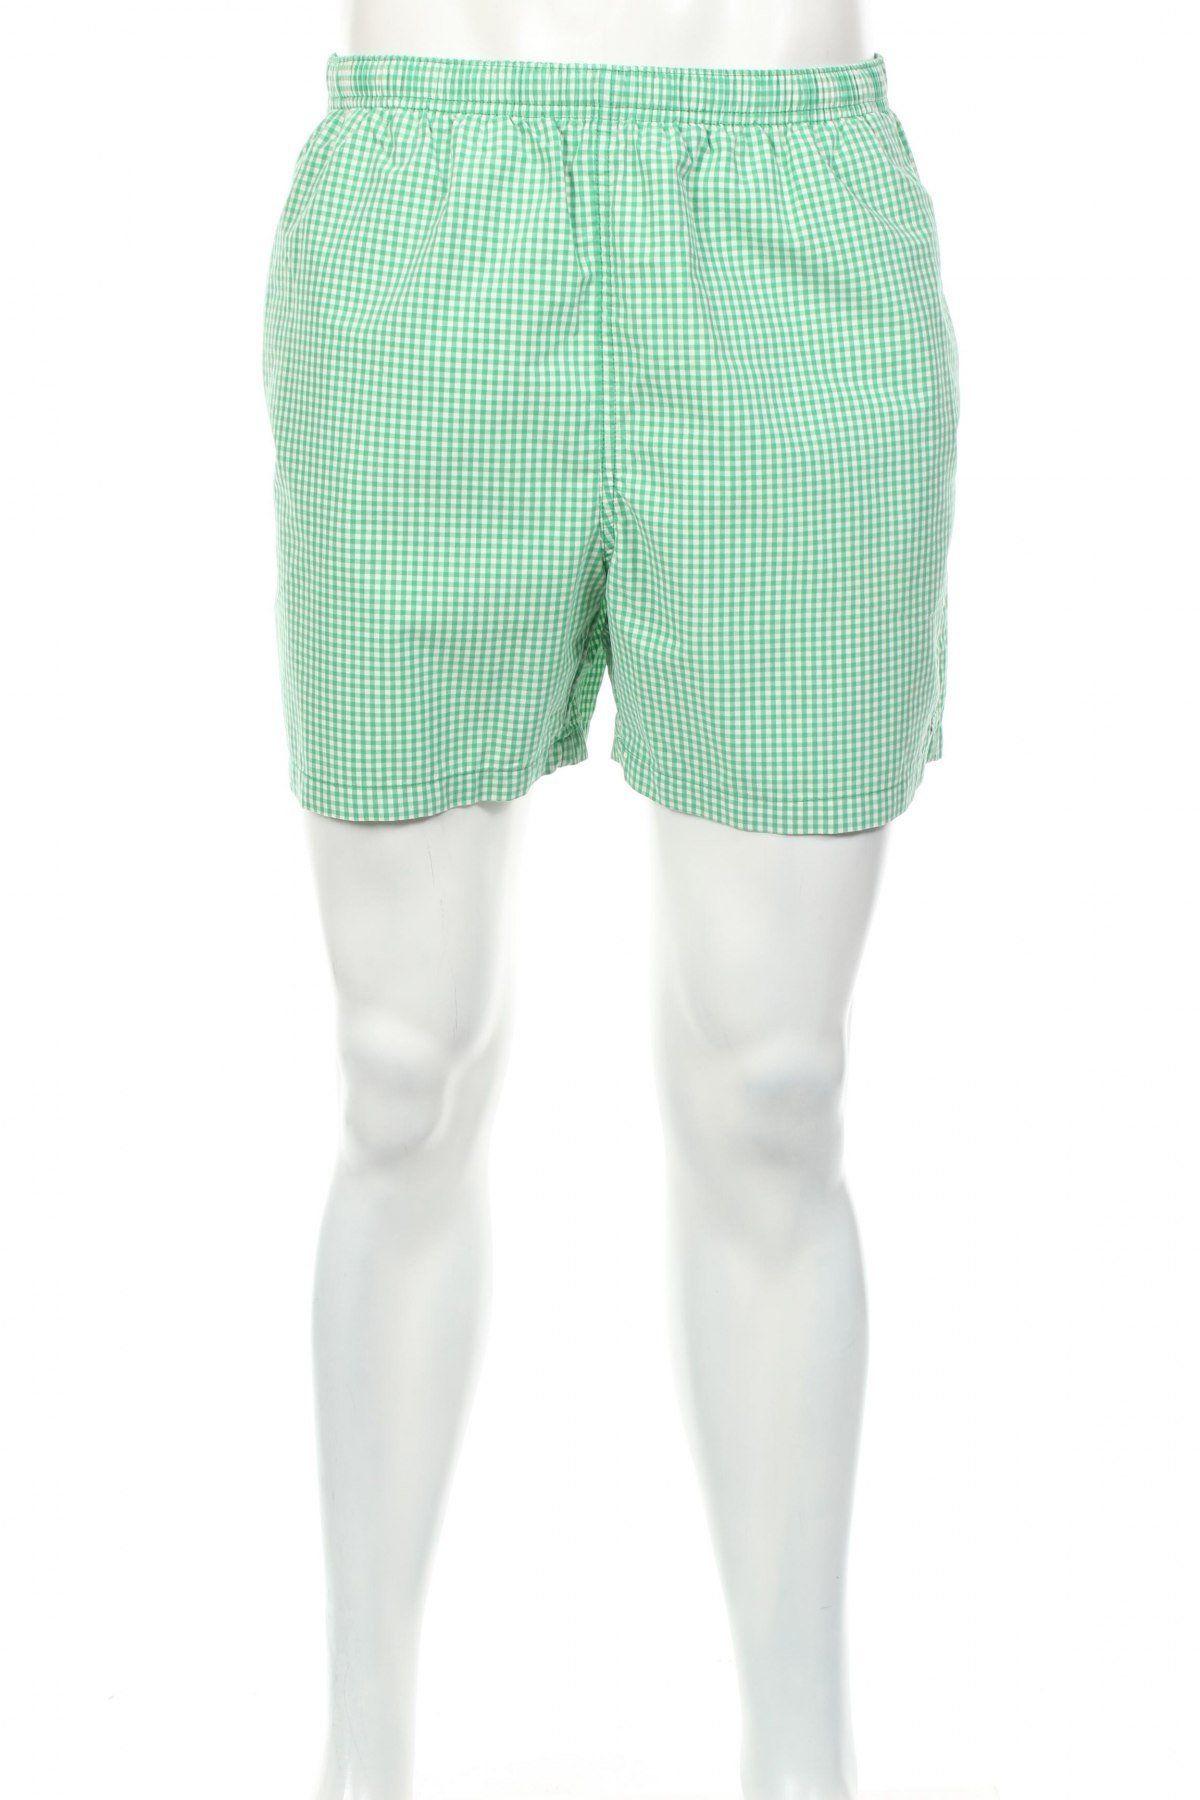 f815a36042 Vintage Polo Sport Ralph Lauren Green Checkered Trunks Swim Shorts Blue  Pony Green/White Size M